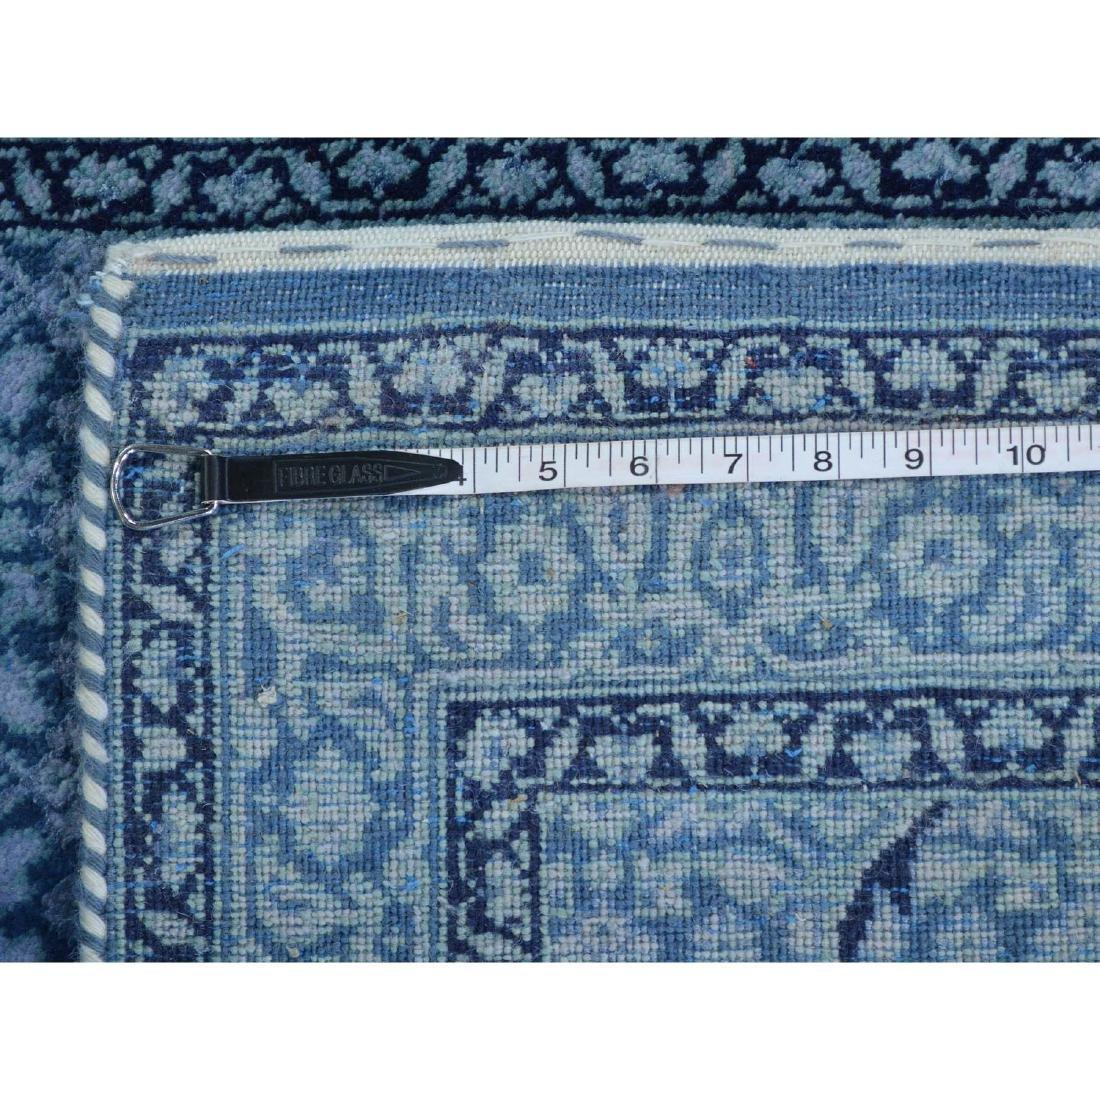 Wool and Silk Tabriz Mahi Runner Oriental Rug Handmade - 5